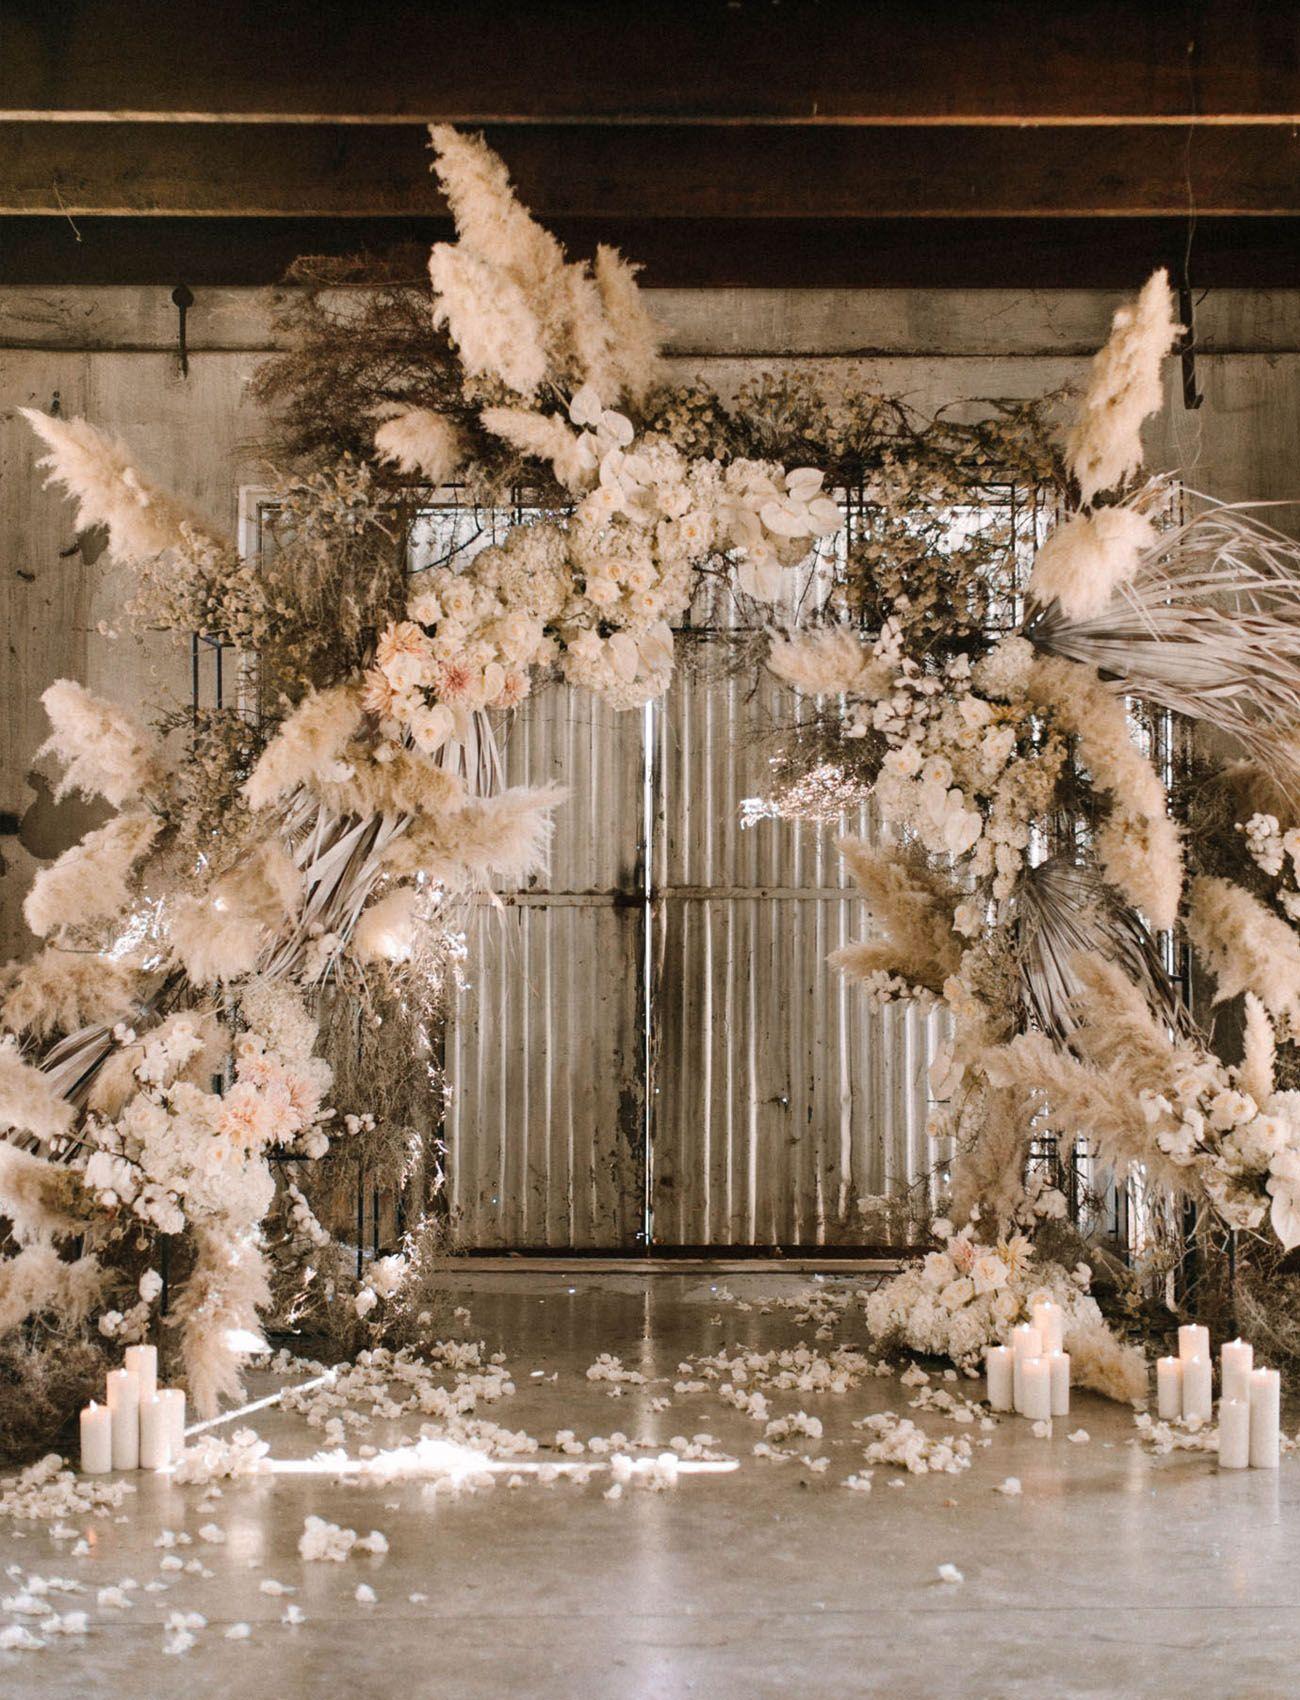 Boho Wedding Inspiration with an Abundance of White + Cream Textured Florals